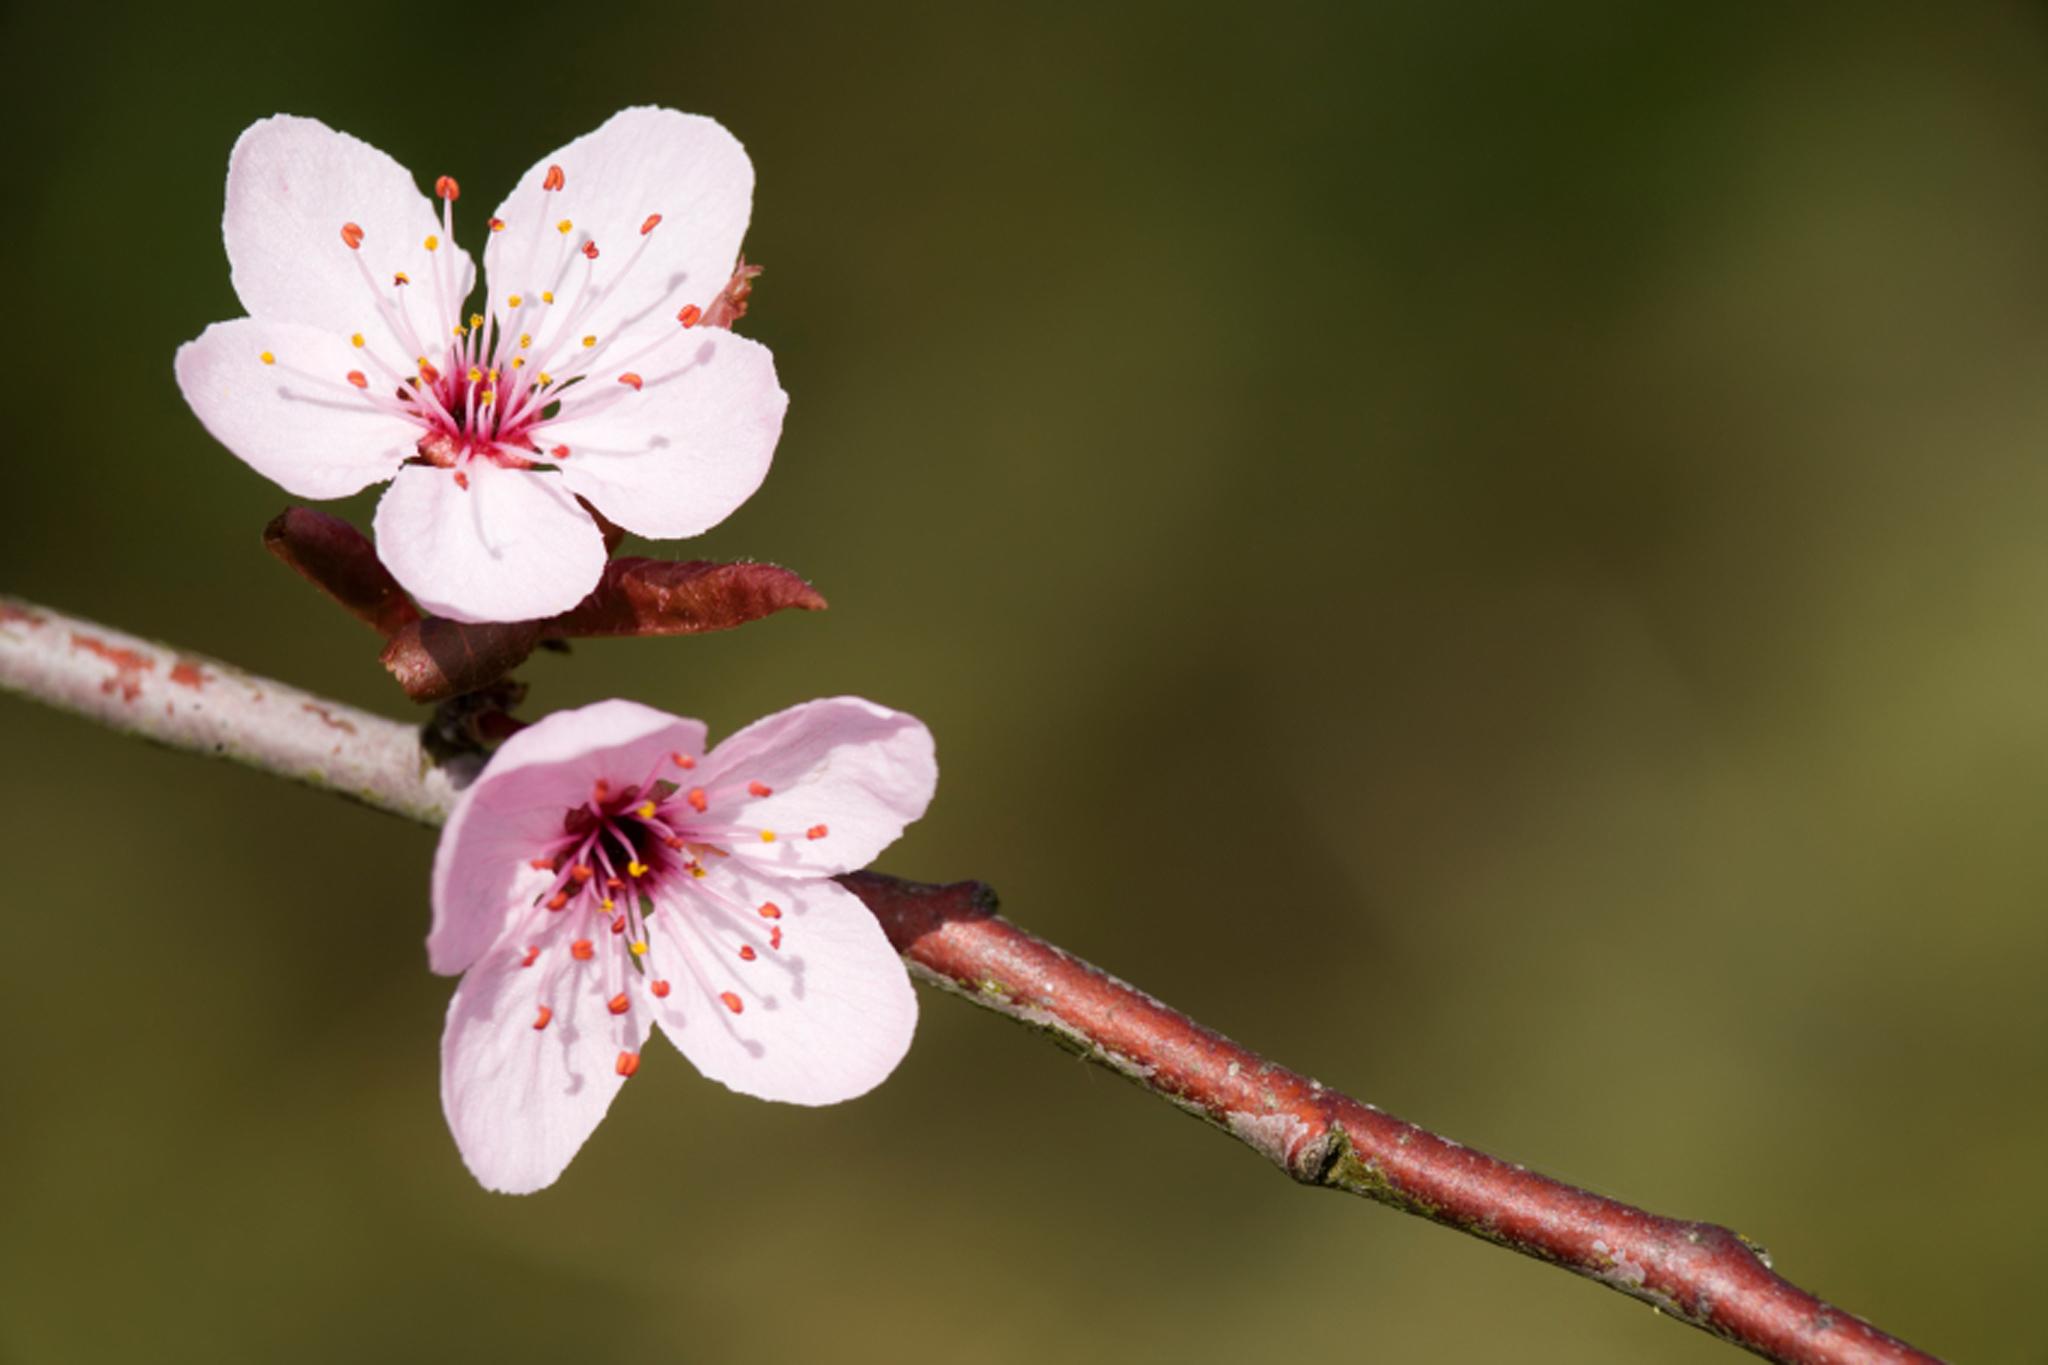 Randall's Island Cherry Blossom Festival